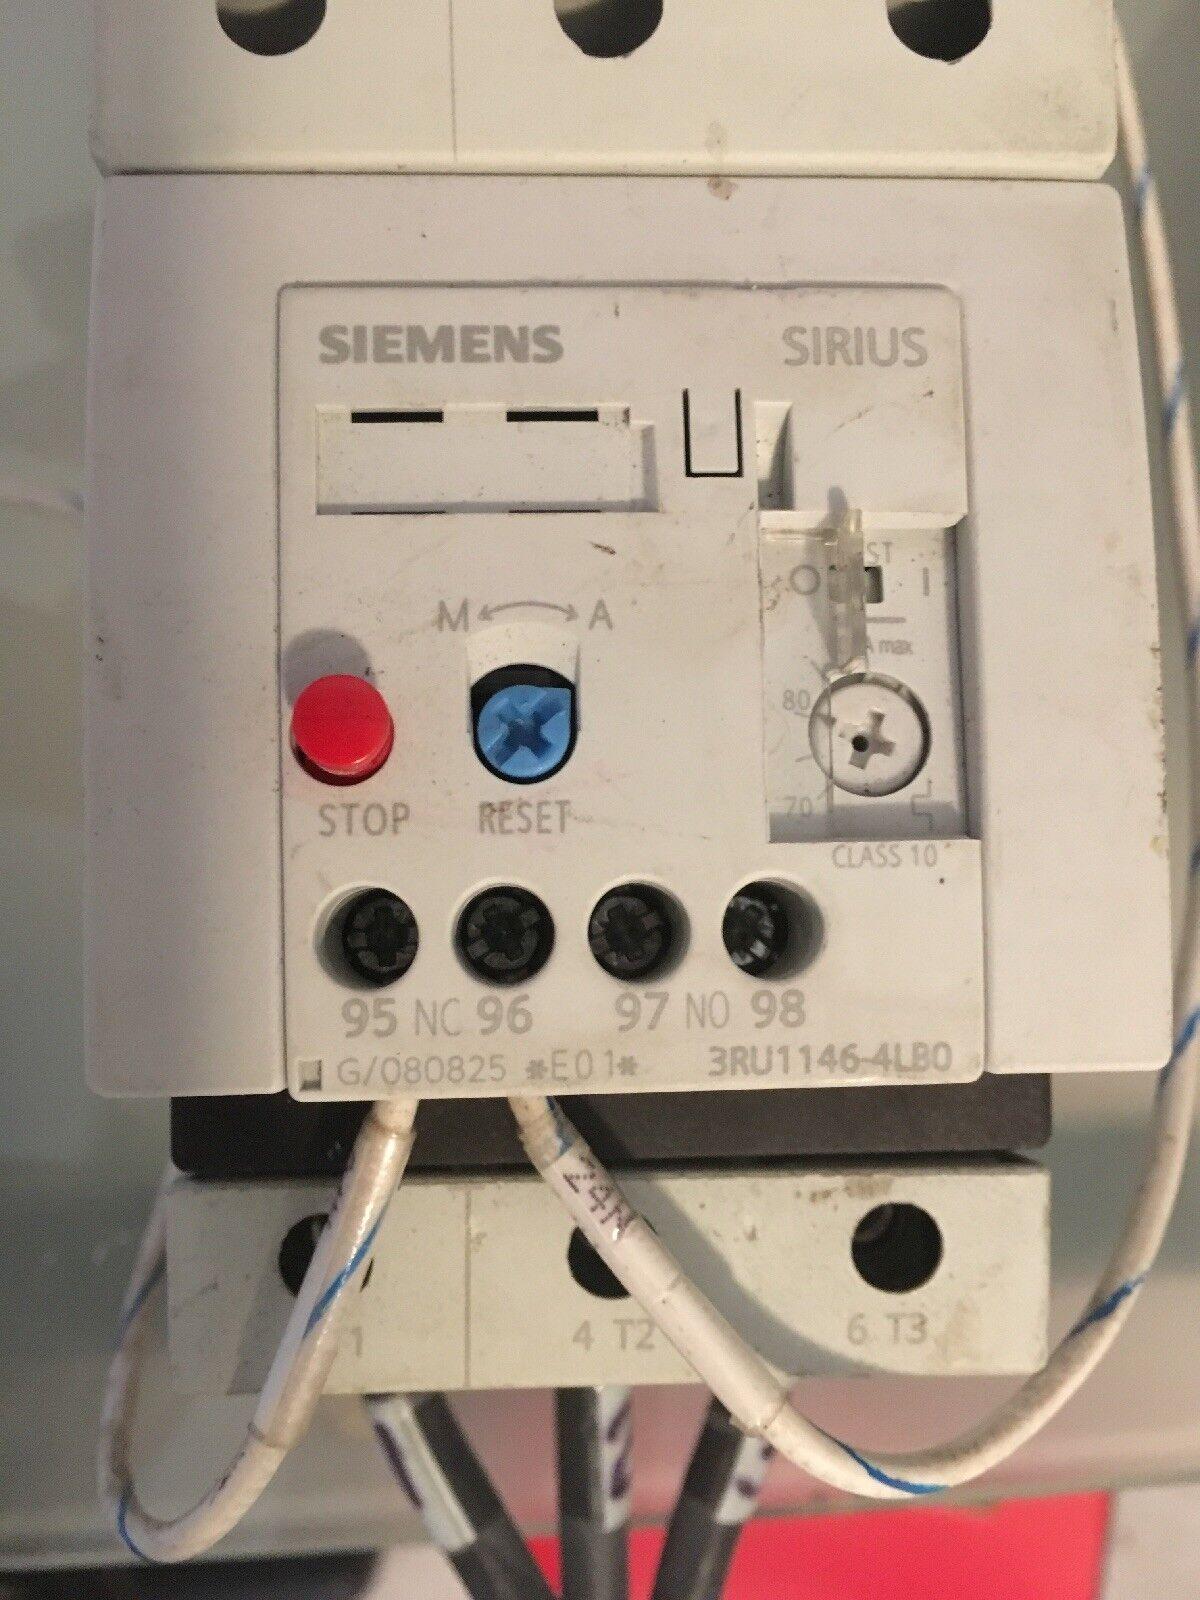 Siemens Sirius 3RU1146-4LB0 Motor Starter Overload Relay 3RT Contactor S3 70-90A